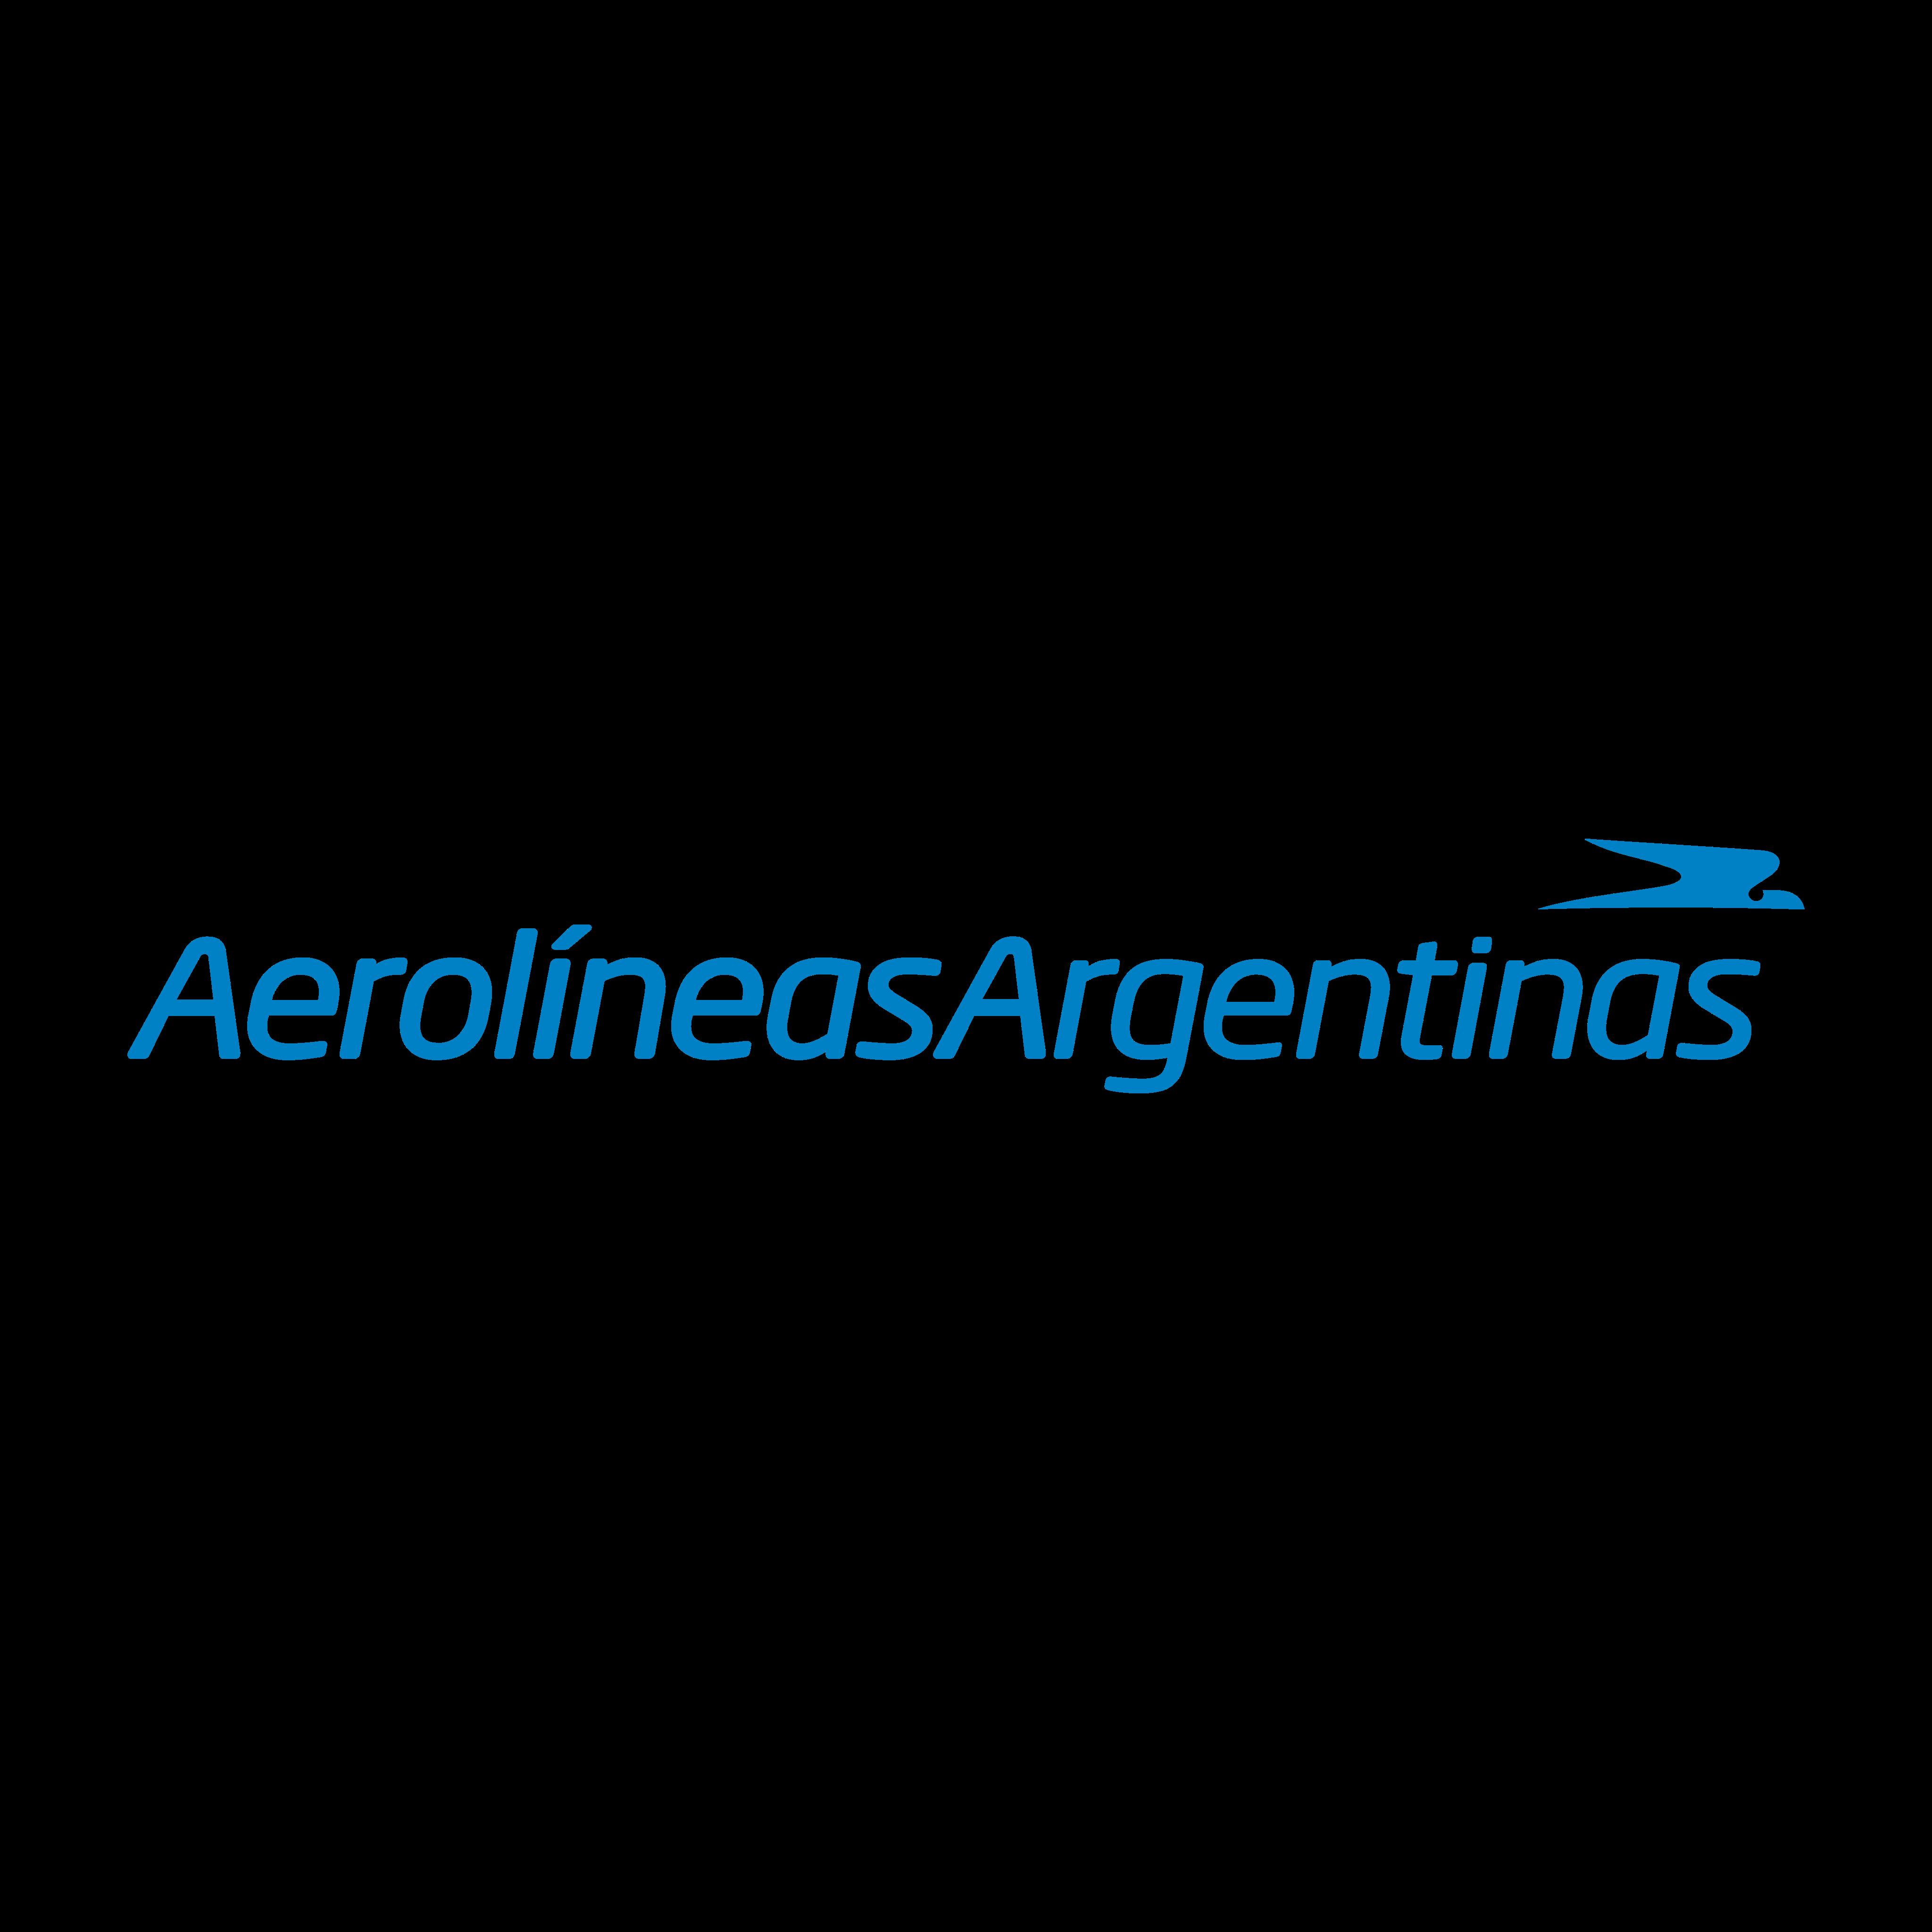 aero lineas argentinas logo 0 - Aerolíneas Argentinas Logo